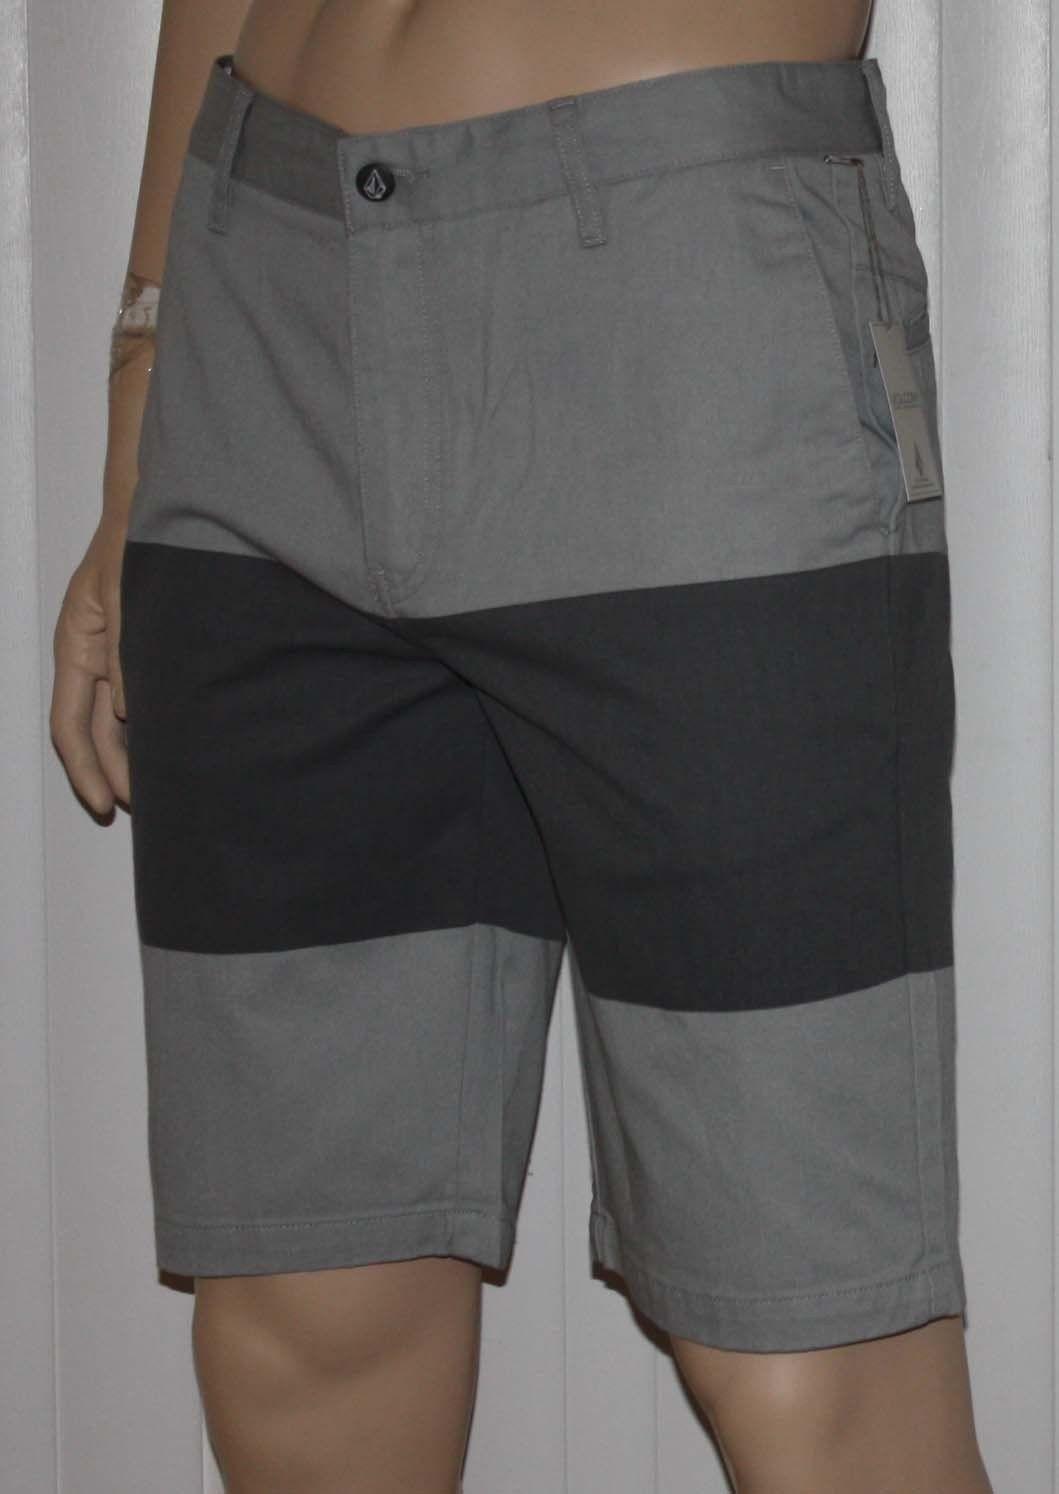 Volcom V/Monty Men's Gray/Charcoal Gray Block Shorts (Size 33)